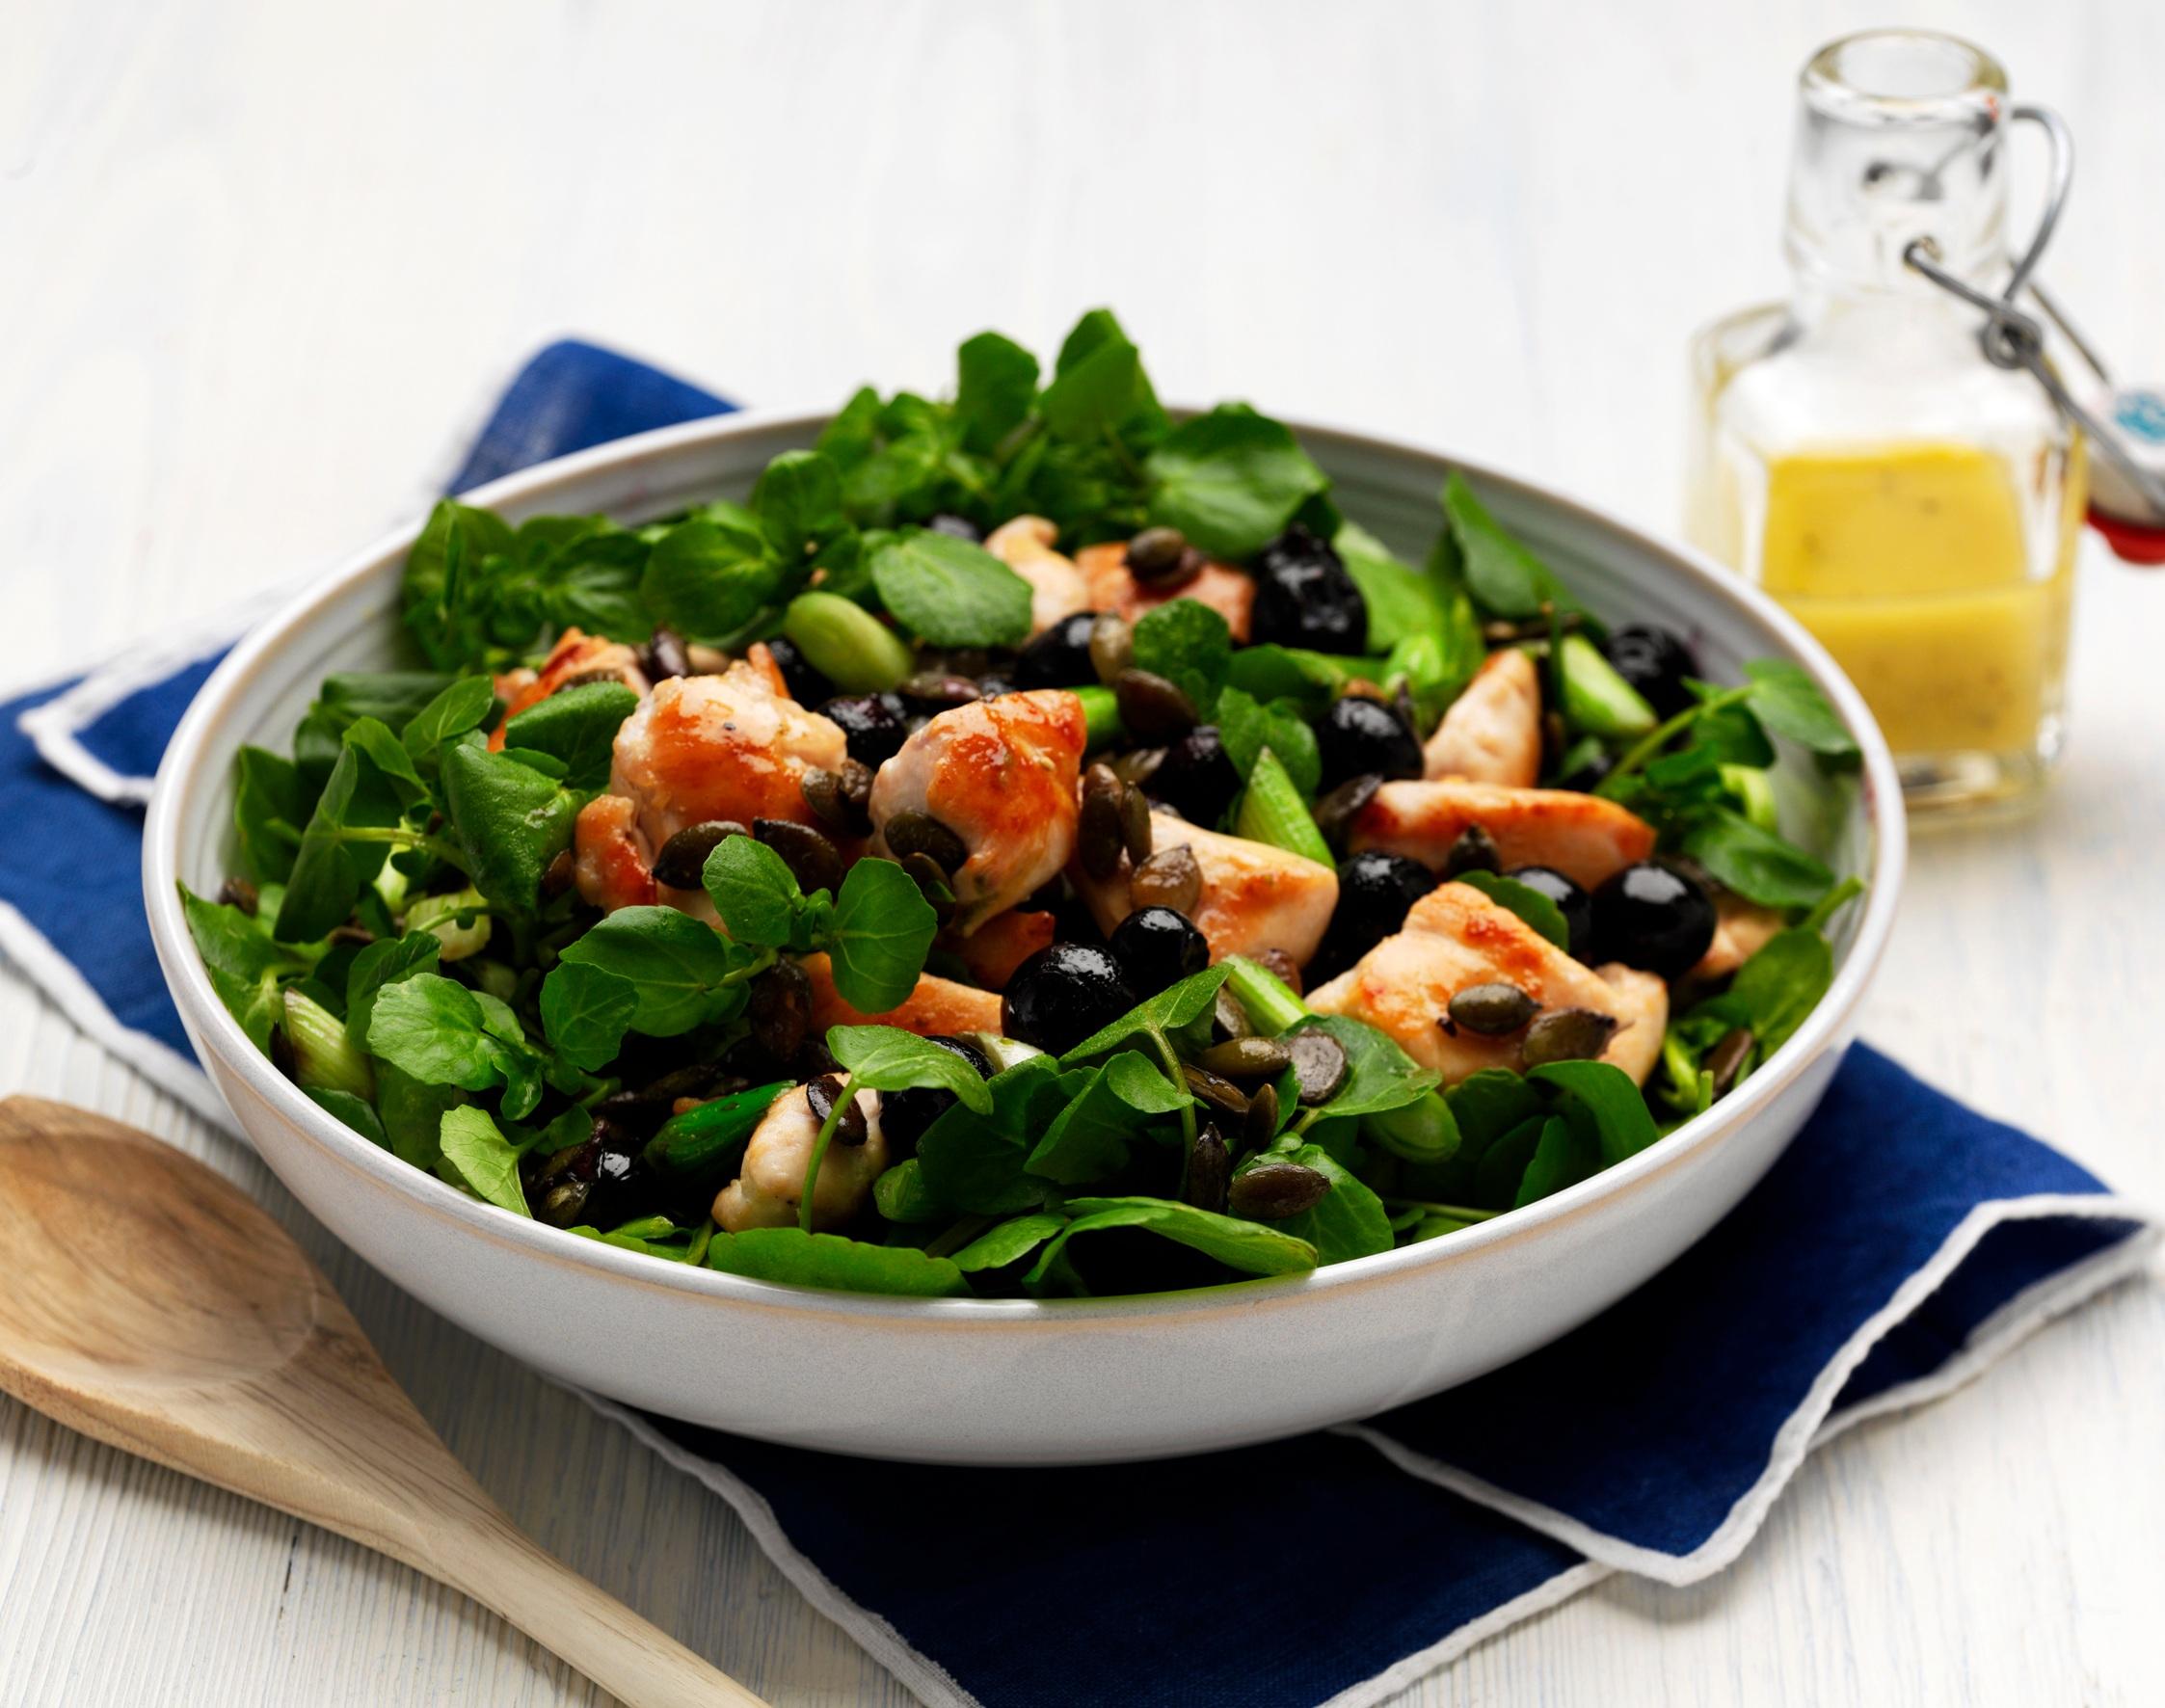 Warm+Chicken+and+blueberry+watercress+salad.jpg